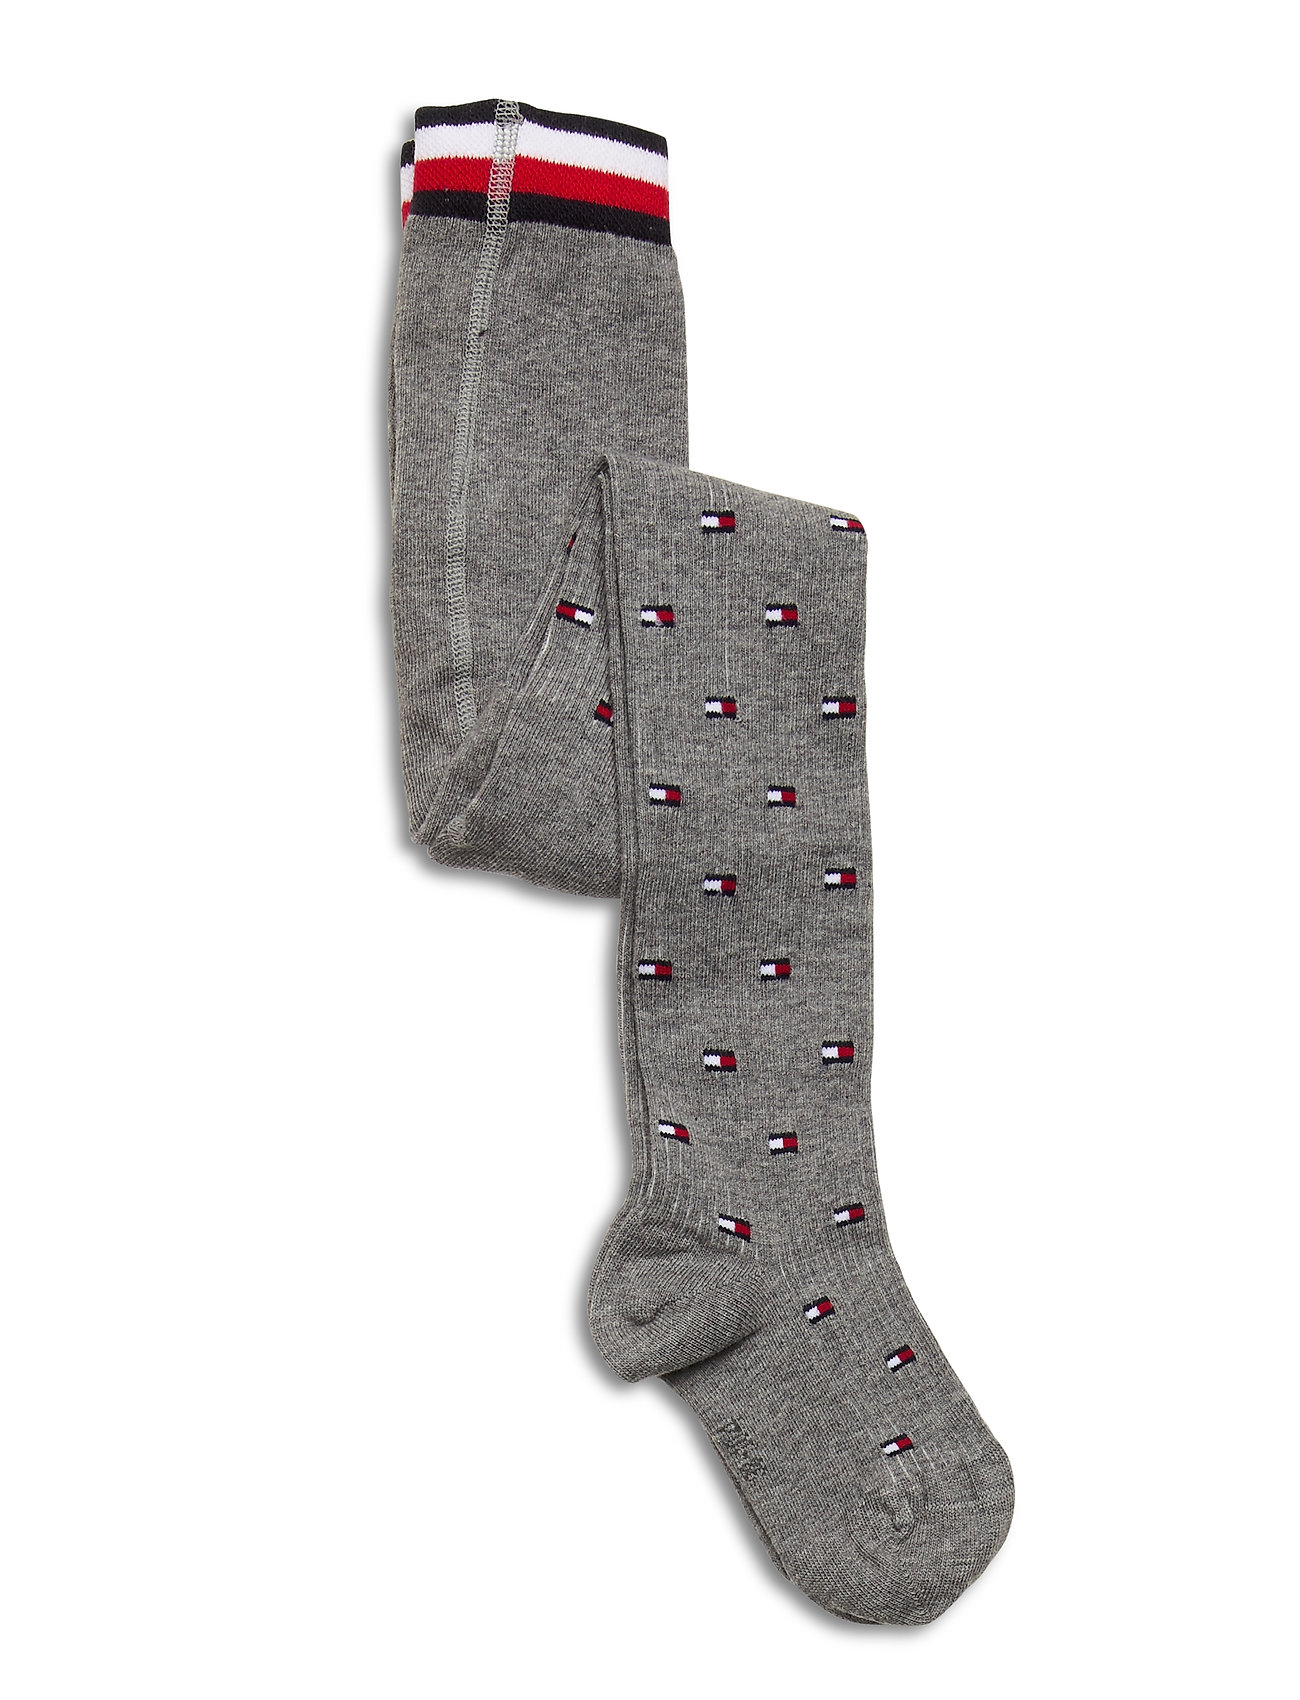 Image of Th Kids Tight 1p Flag Socks & Tights Tights Grå Tommy Hilfiger (3442841587)